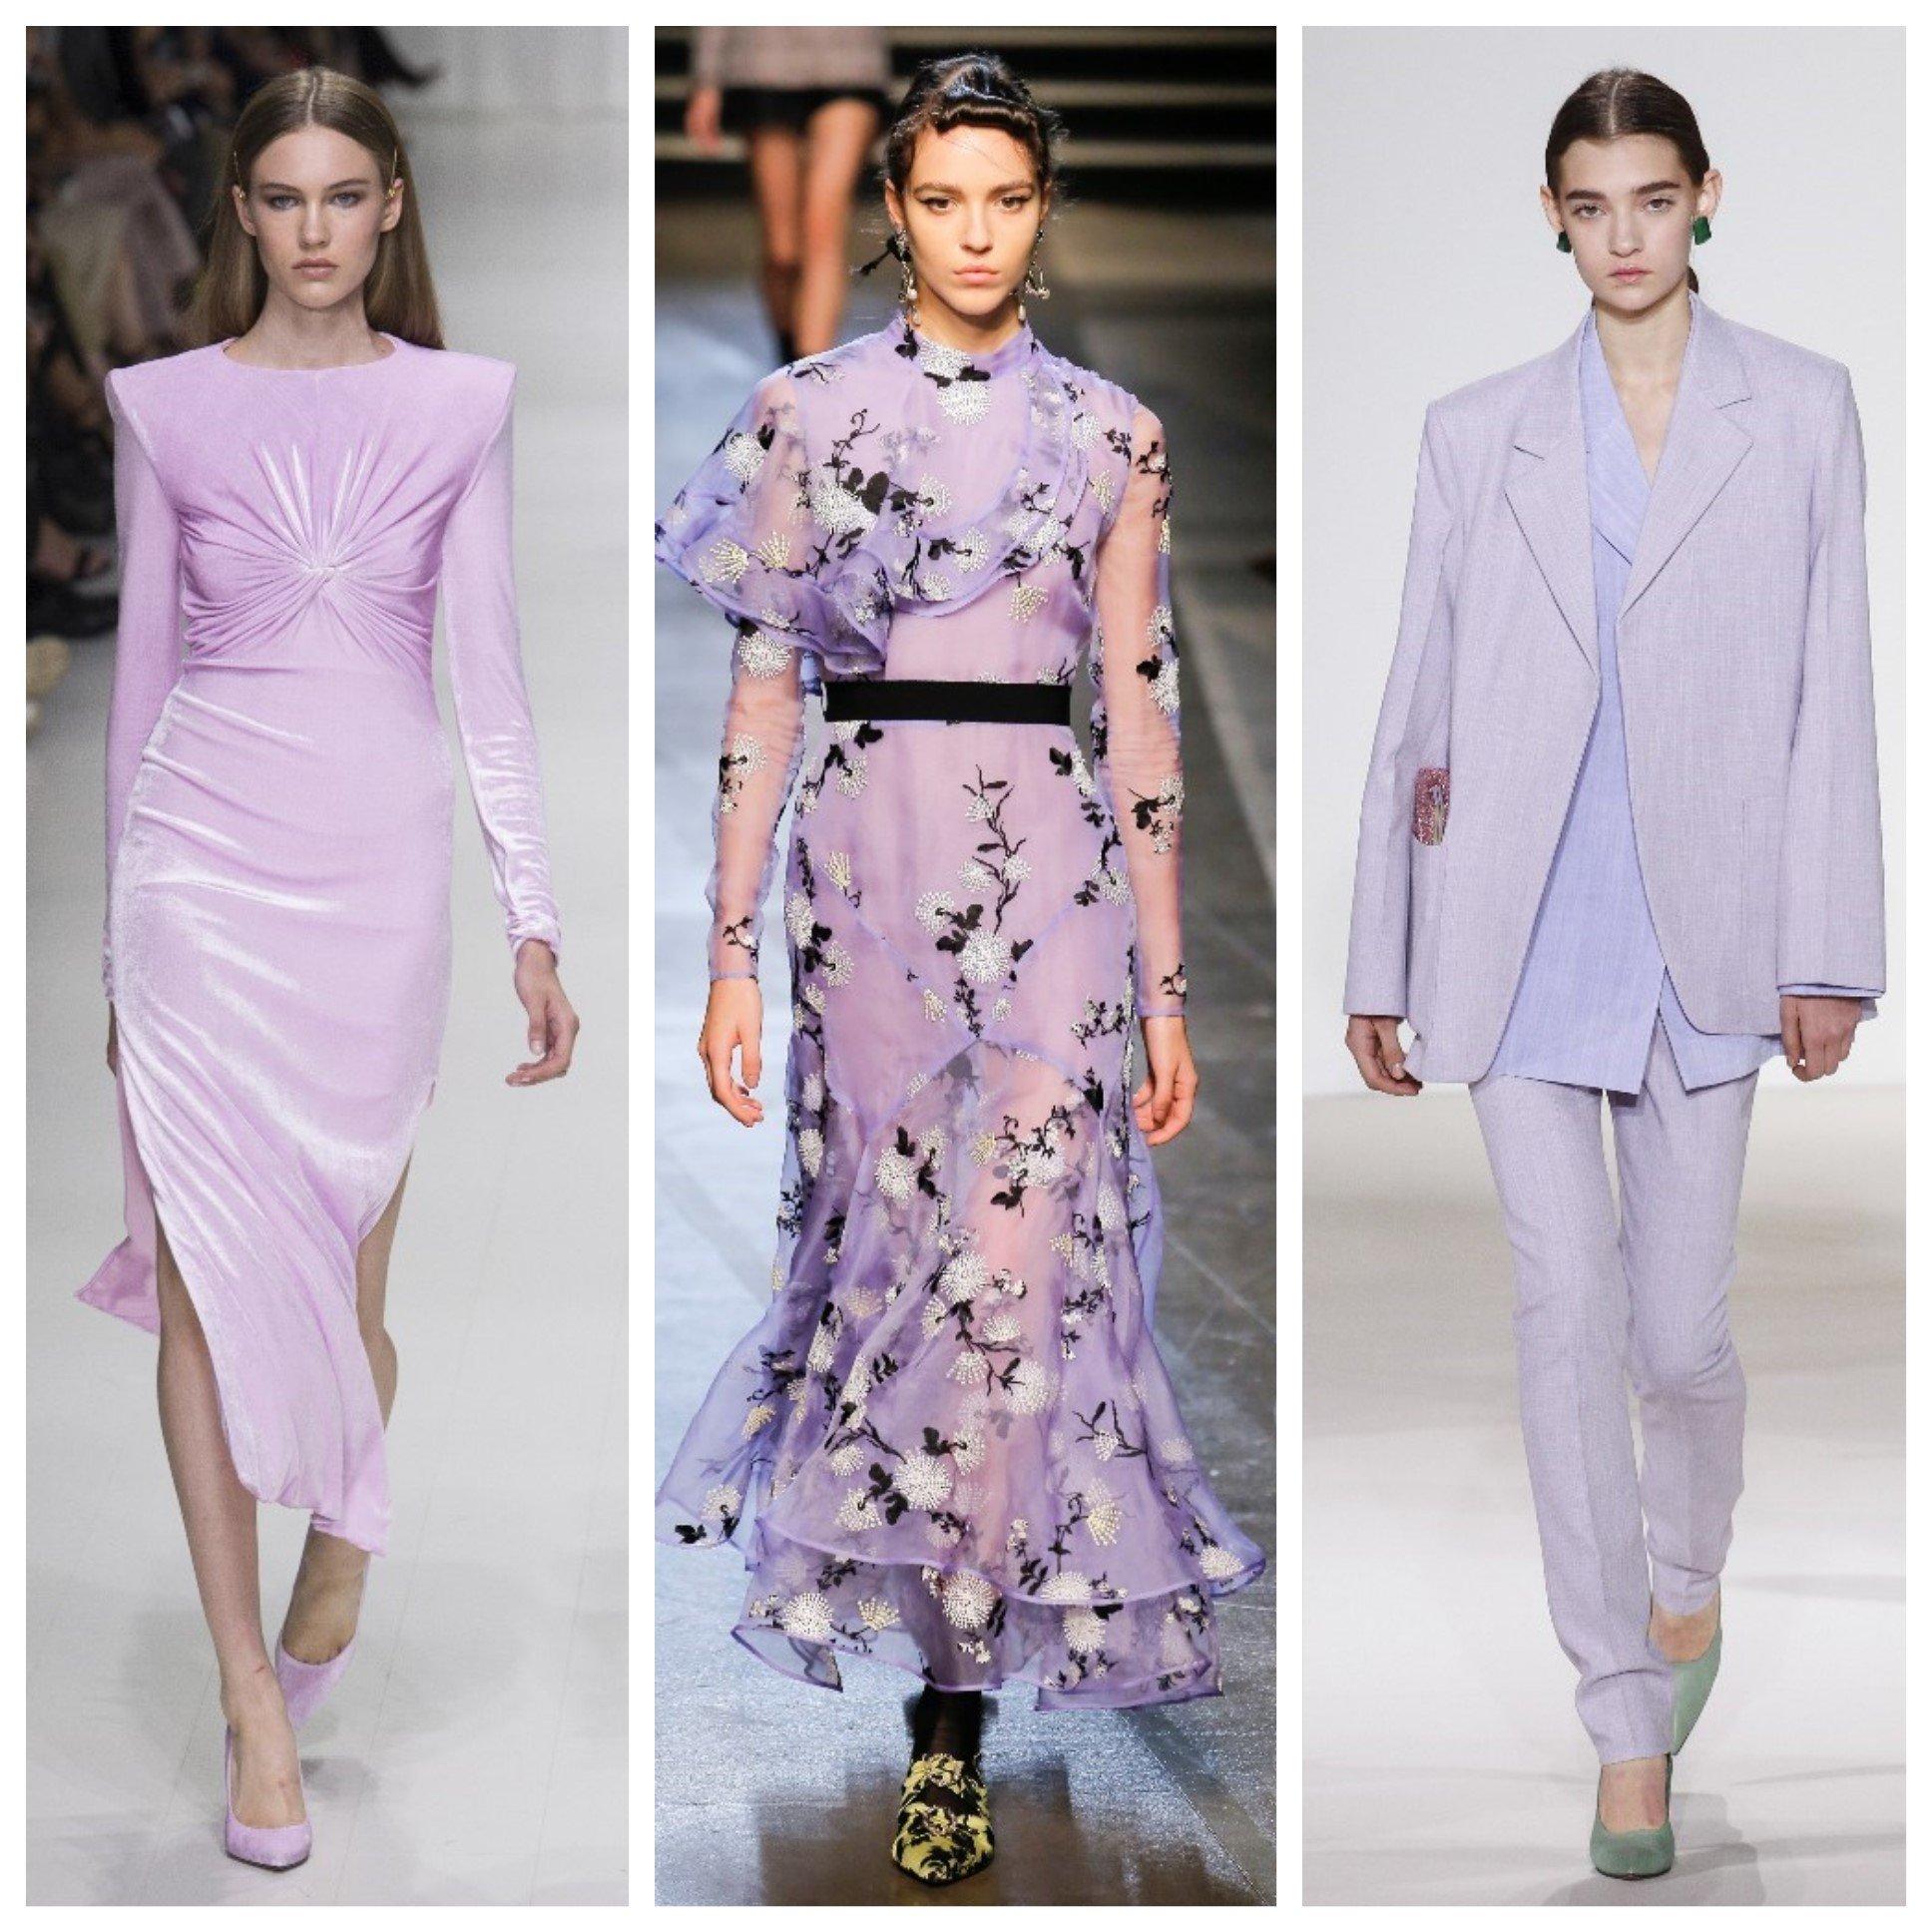 spring 2018 colors lavender